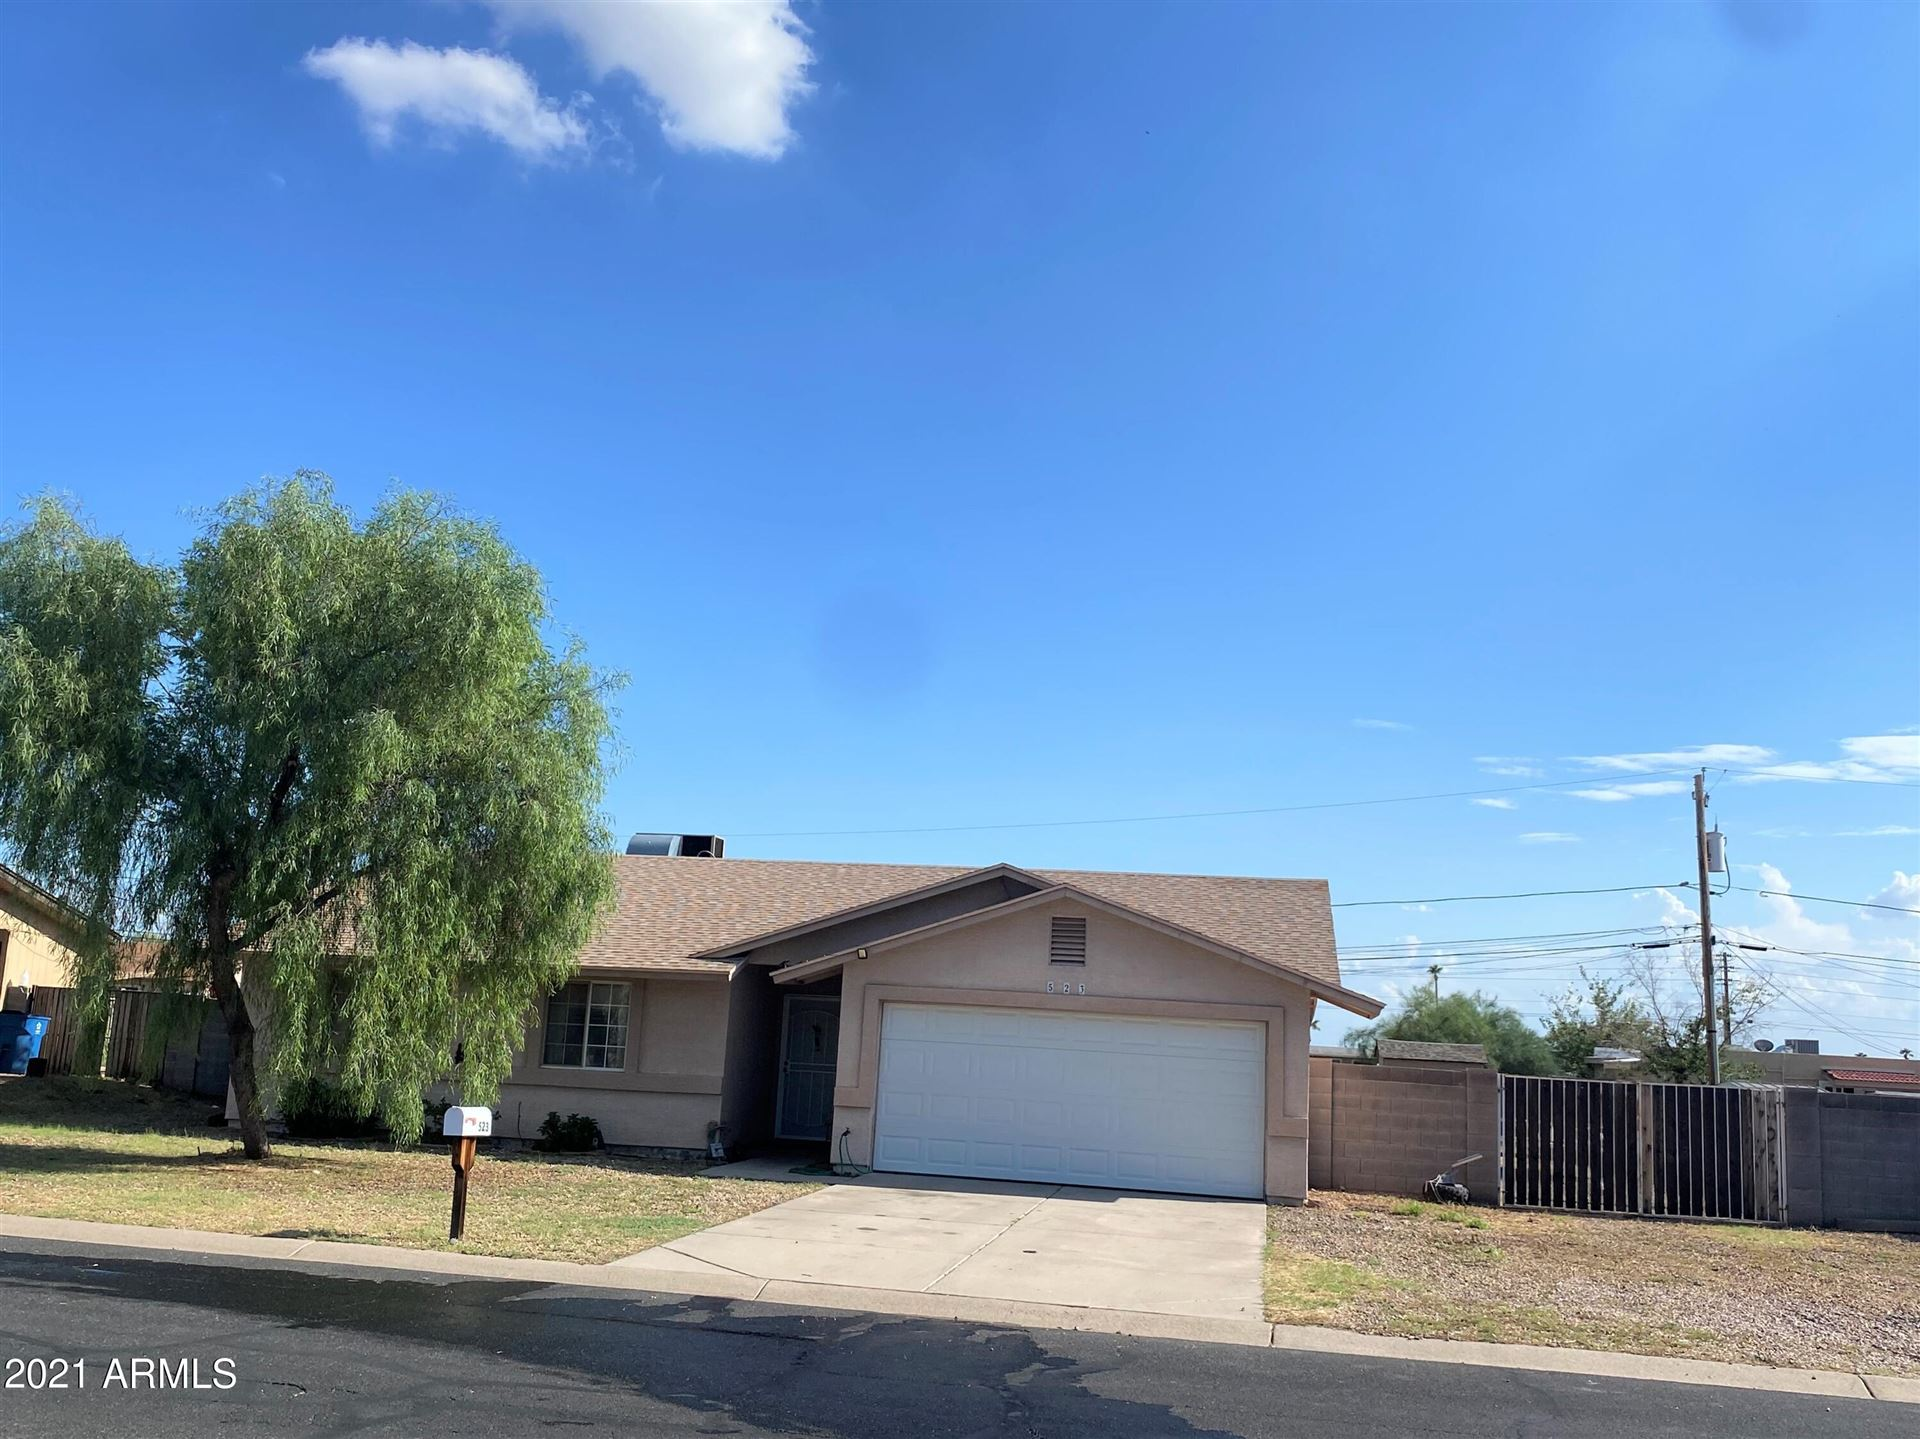 Photo of 523 E QUAIL Avenue, Apache Junction, AZ 85119 (MLS # 6289036)